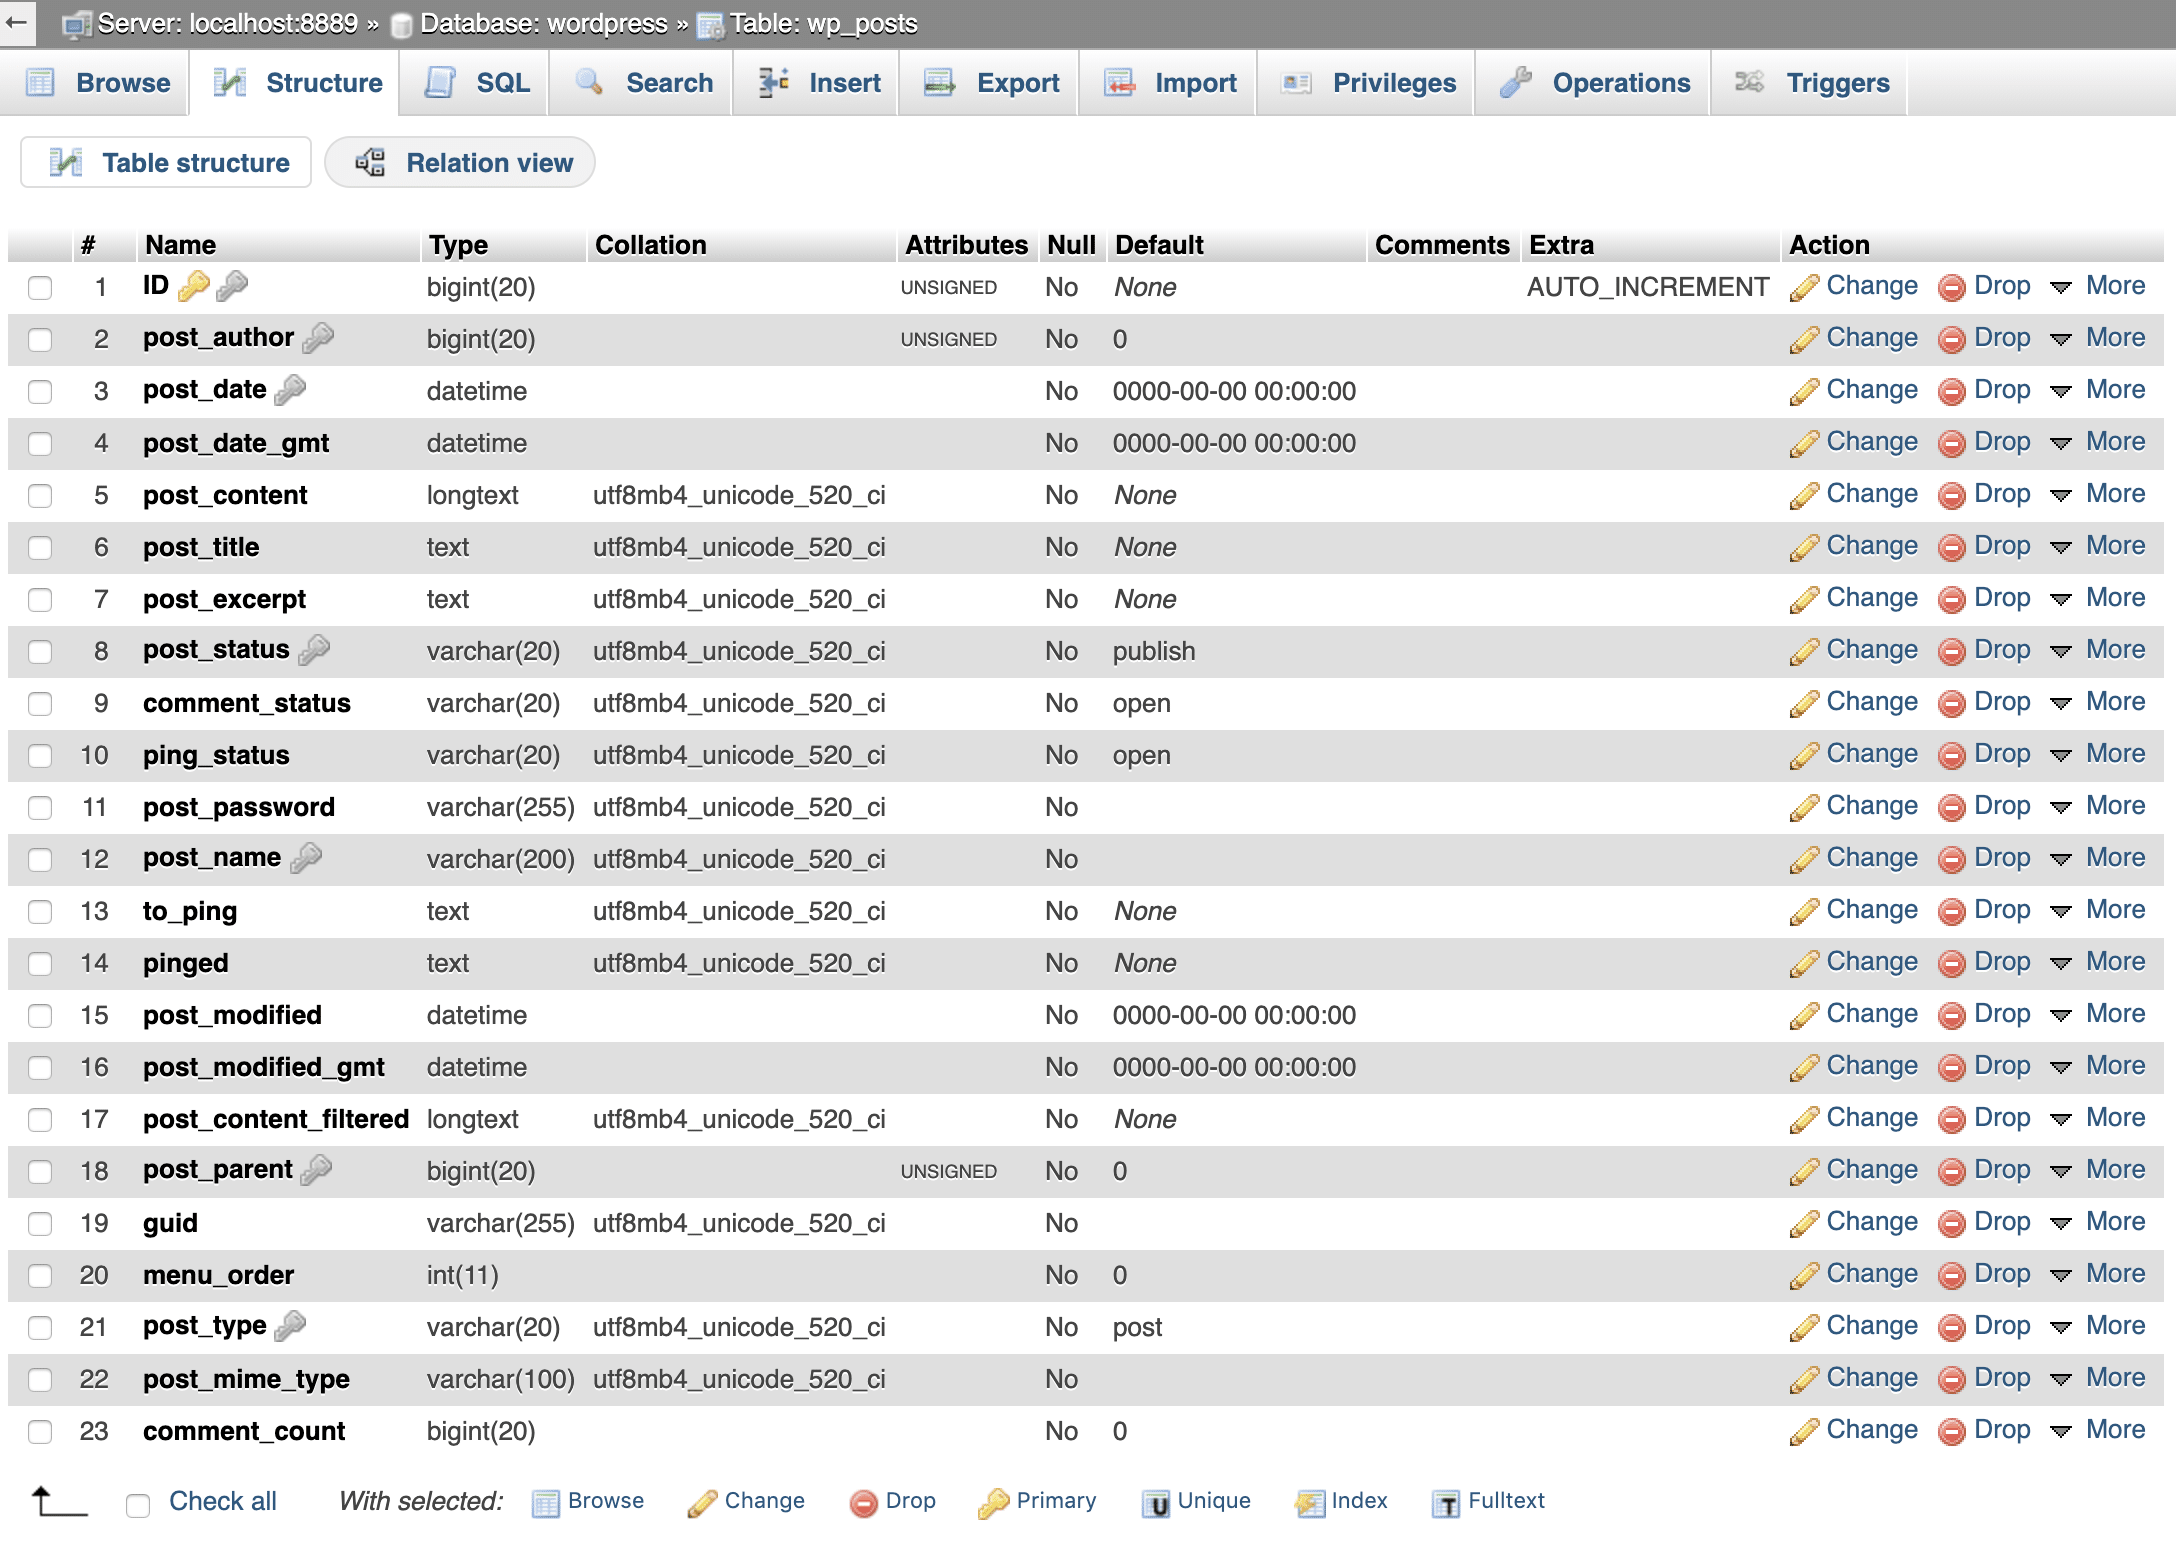 wp_posts-tabelstructuur in phpMyAdmin